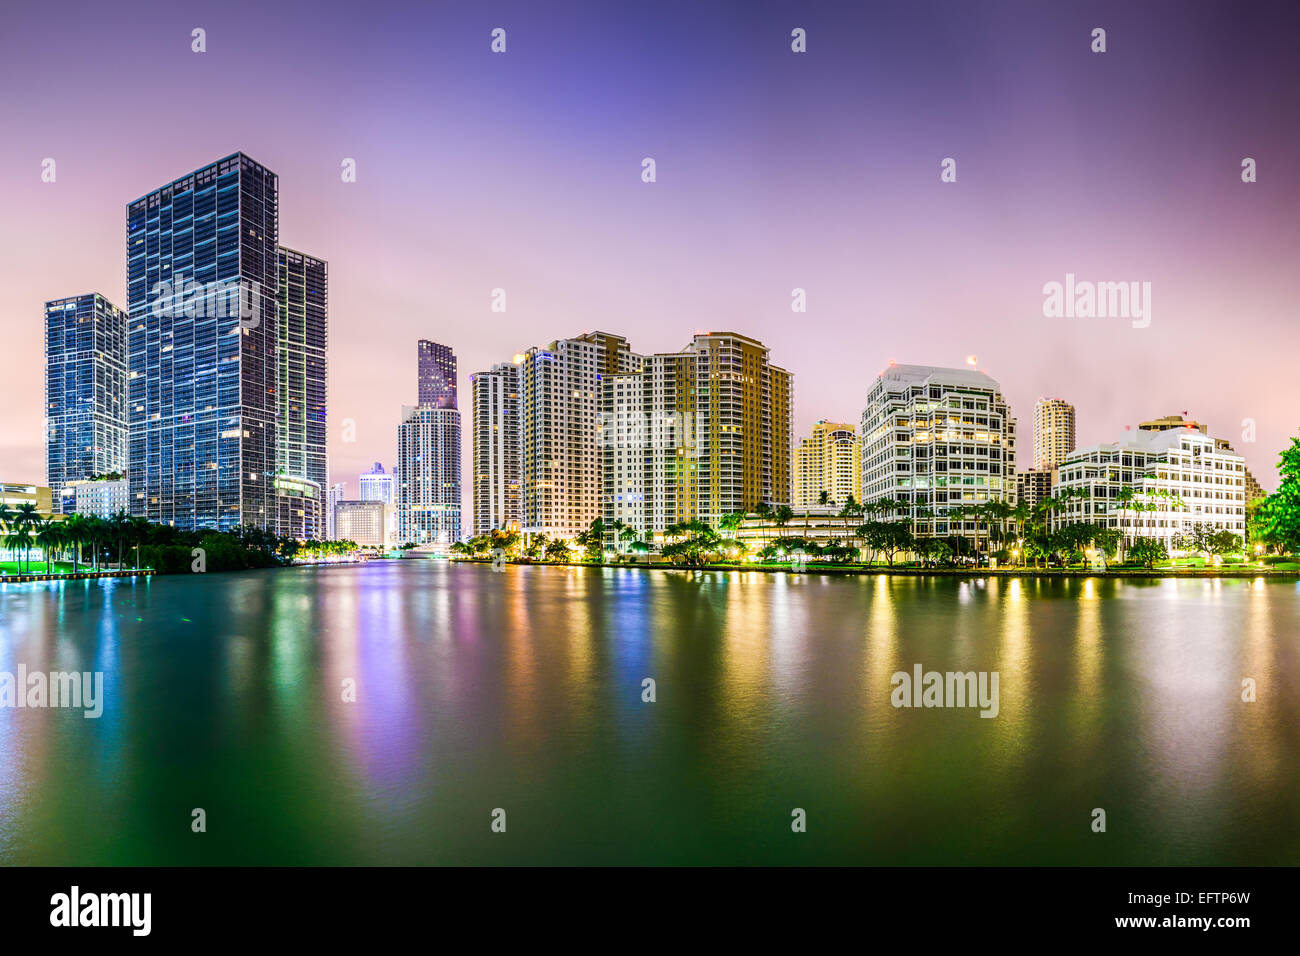 Skyline von Miami, Florida. Stockbild